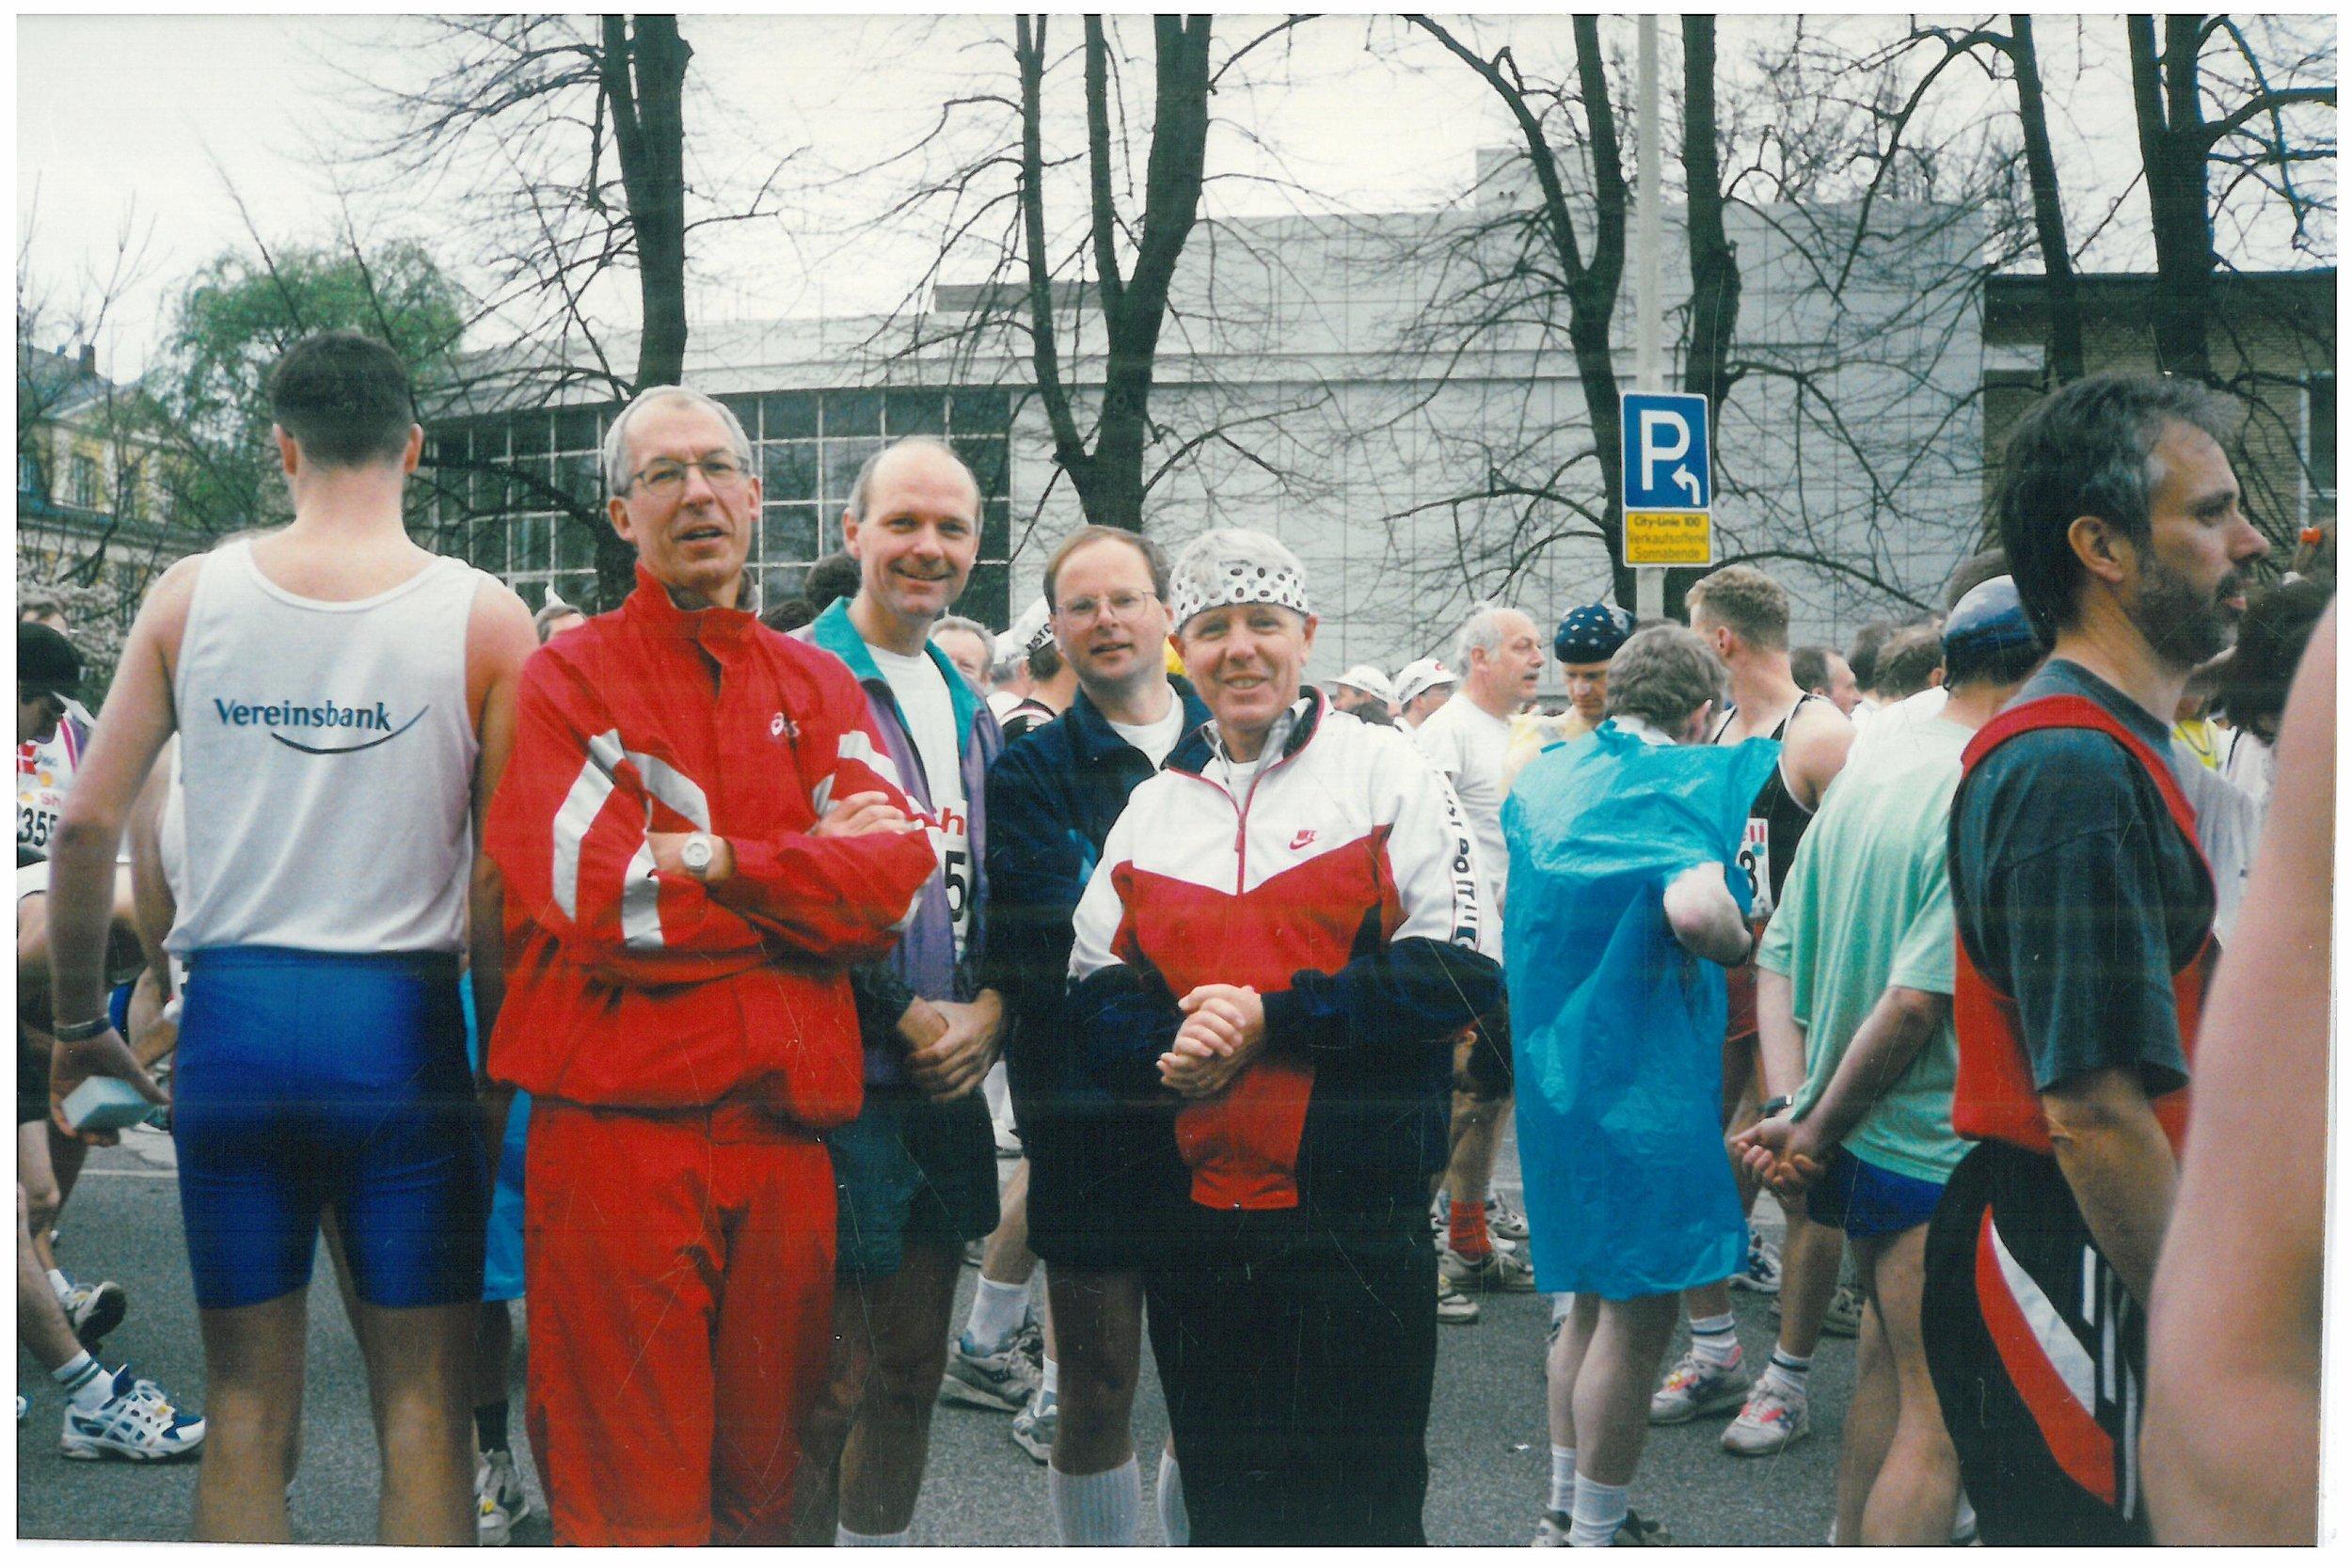 1998 Berlin half marathon before the start